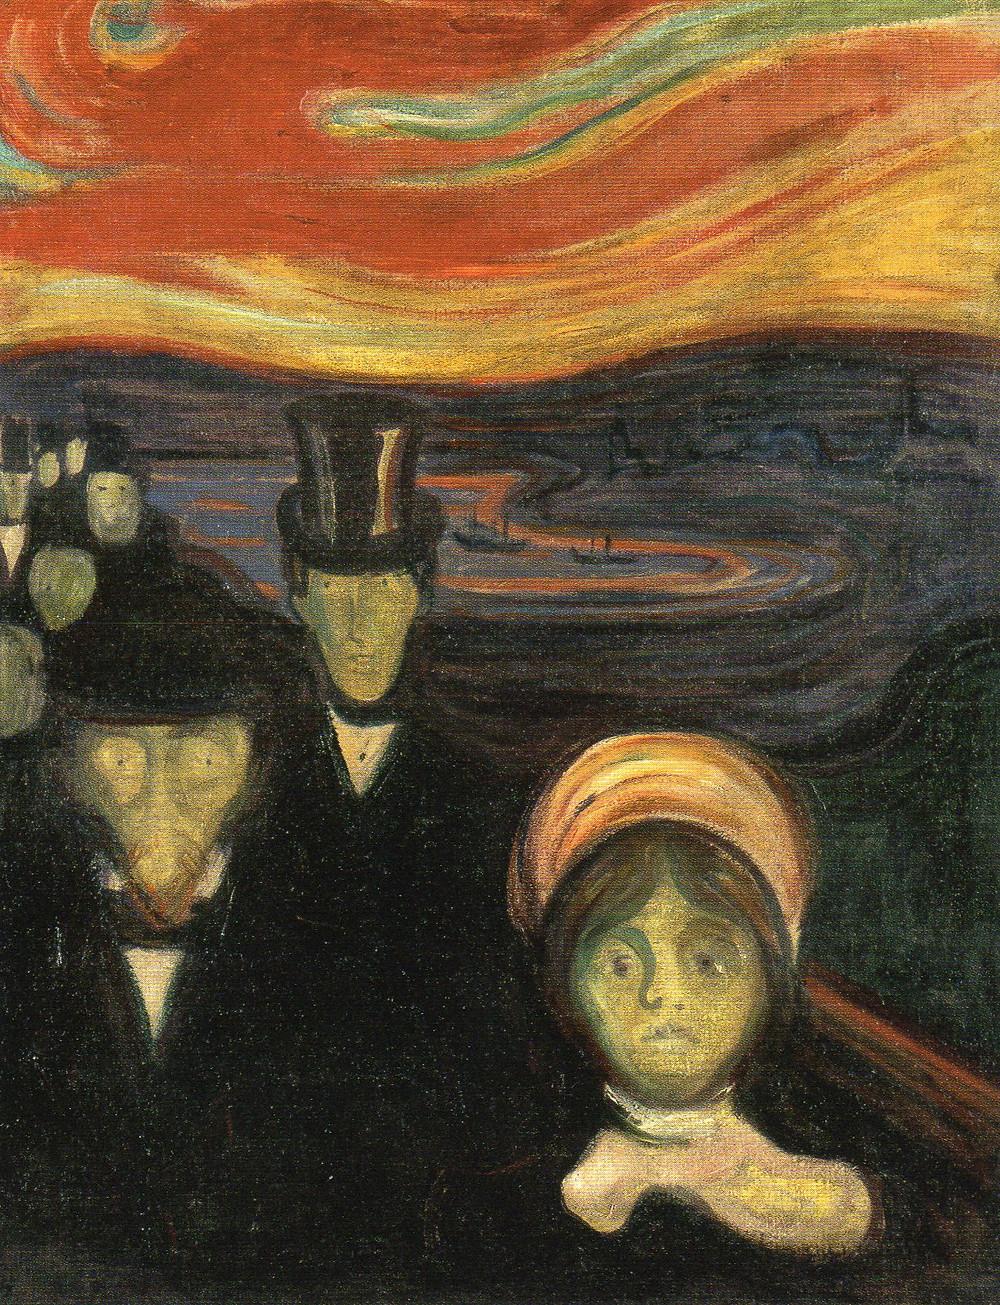 """Angst"", Edvard Munch, 1894"